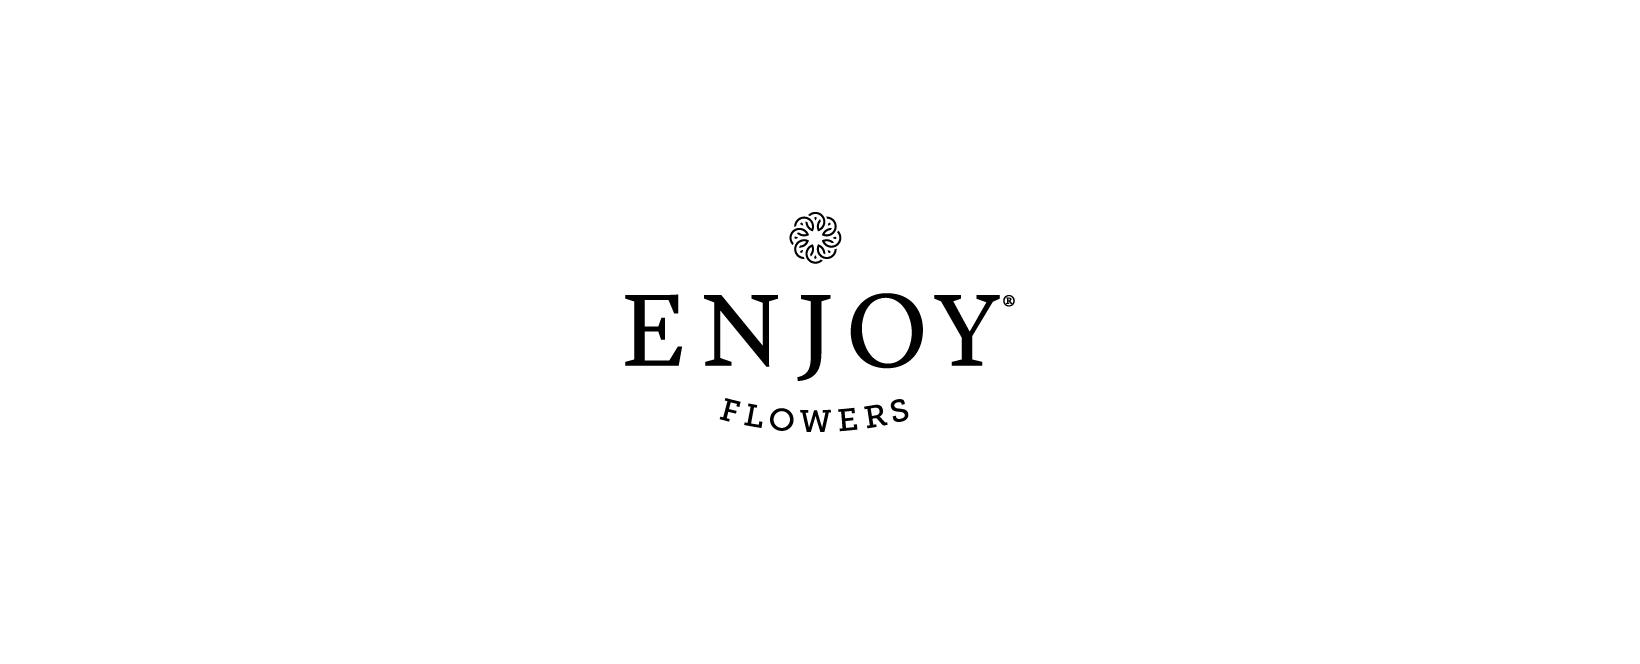 Enjoy Flowers Coupon Code 2021